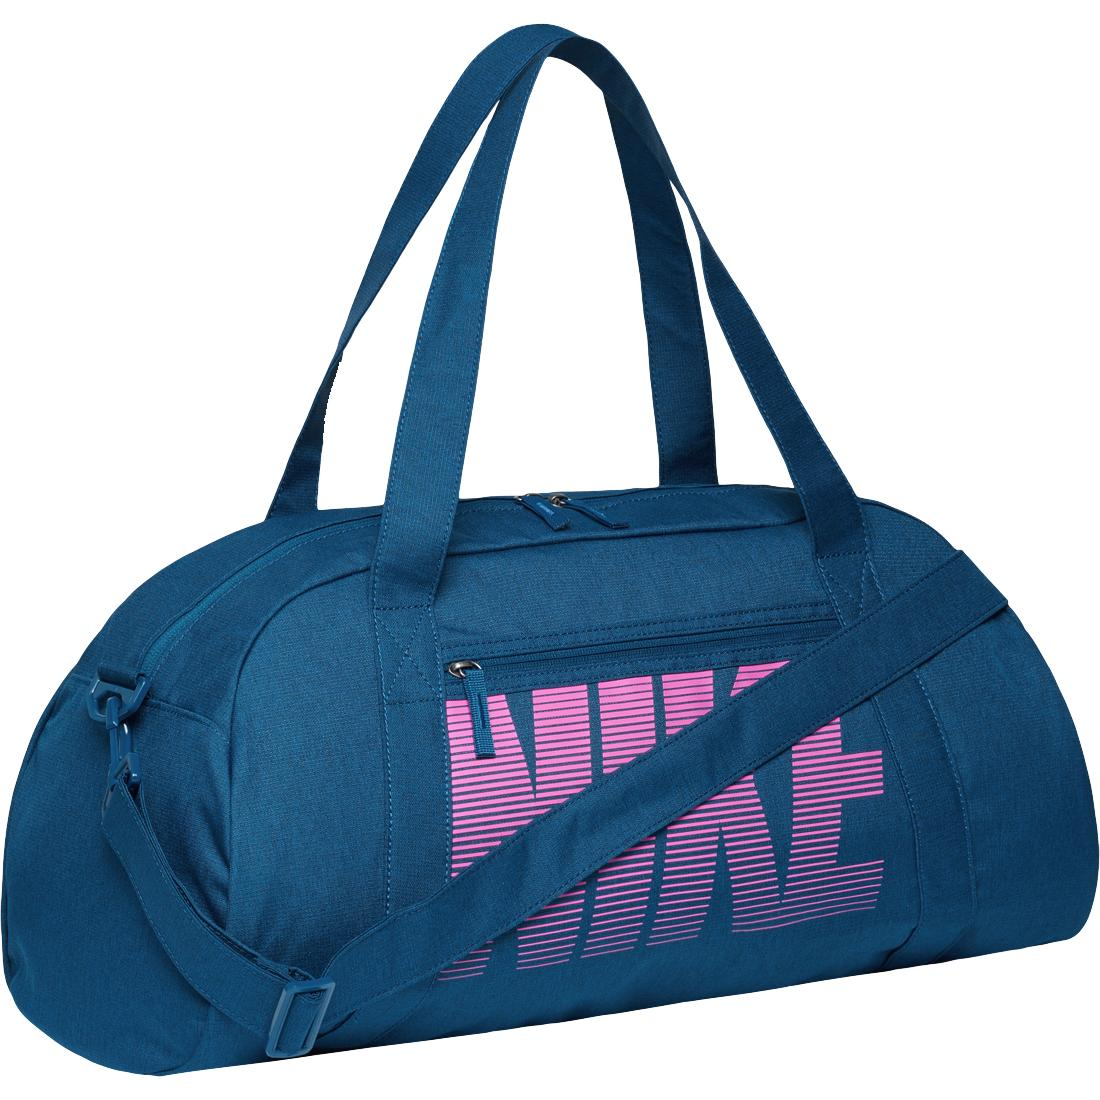 Nike Shoulder Bag Sports Direct  a309360dd4e5a